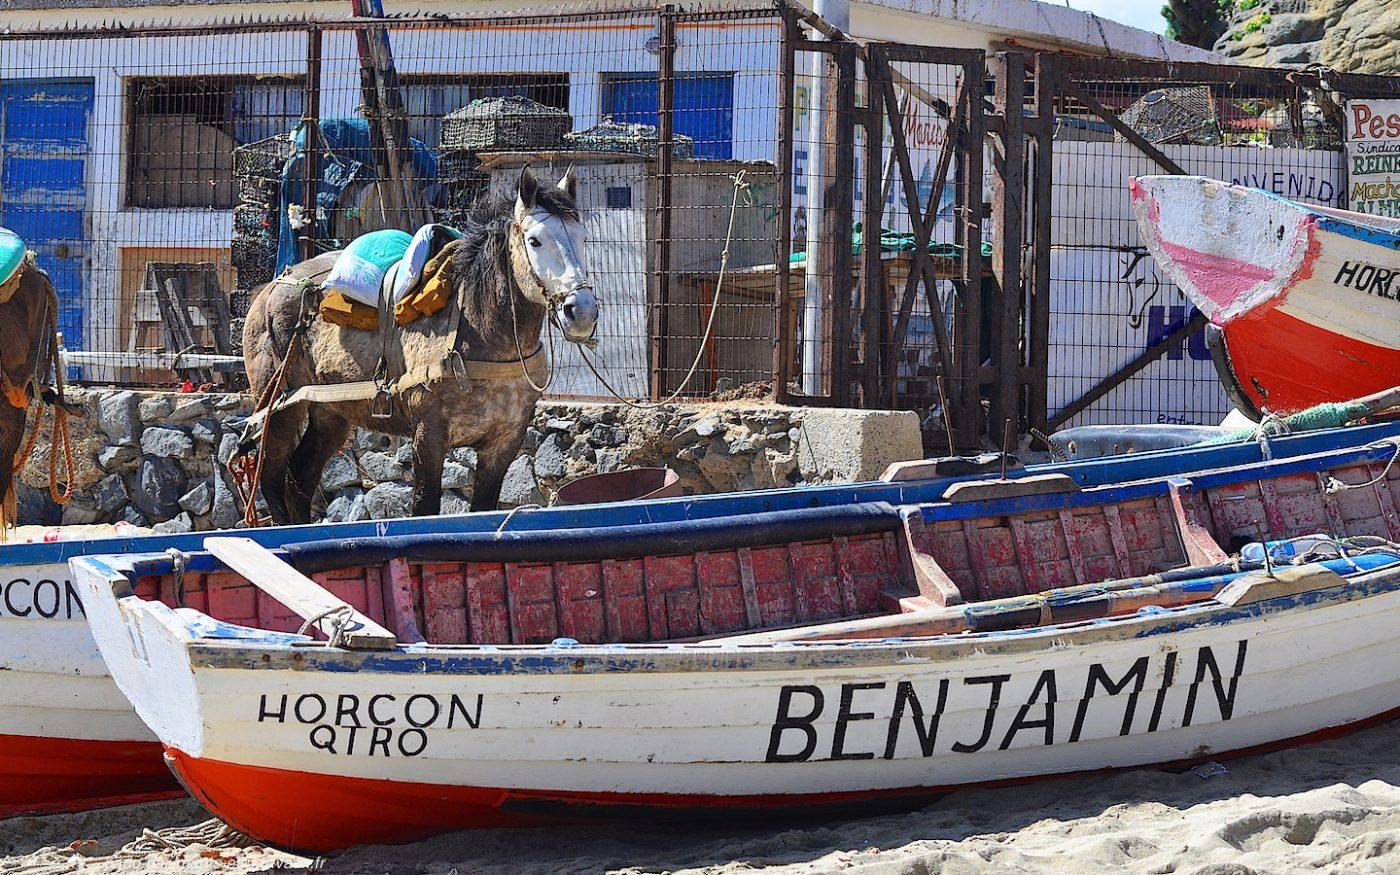 Horcon pêcheurs